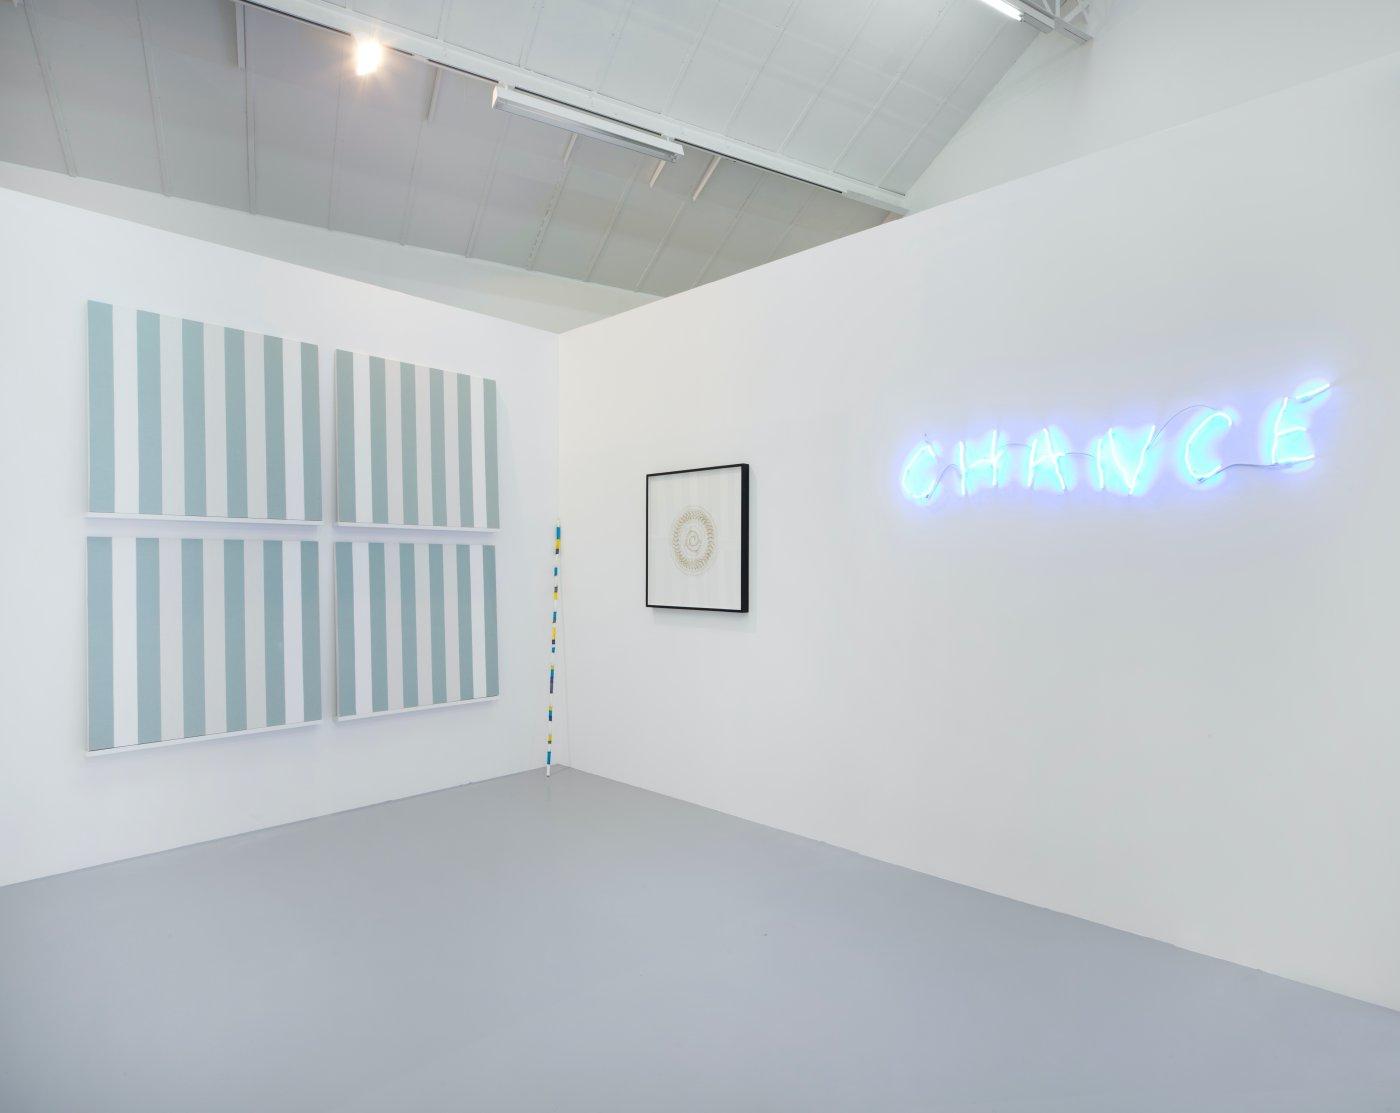 kamel mennour FIAC in the galleries 8